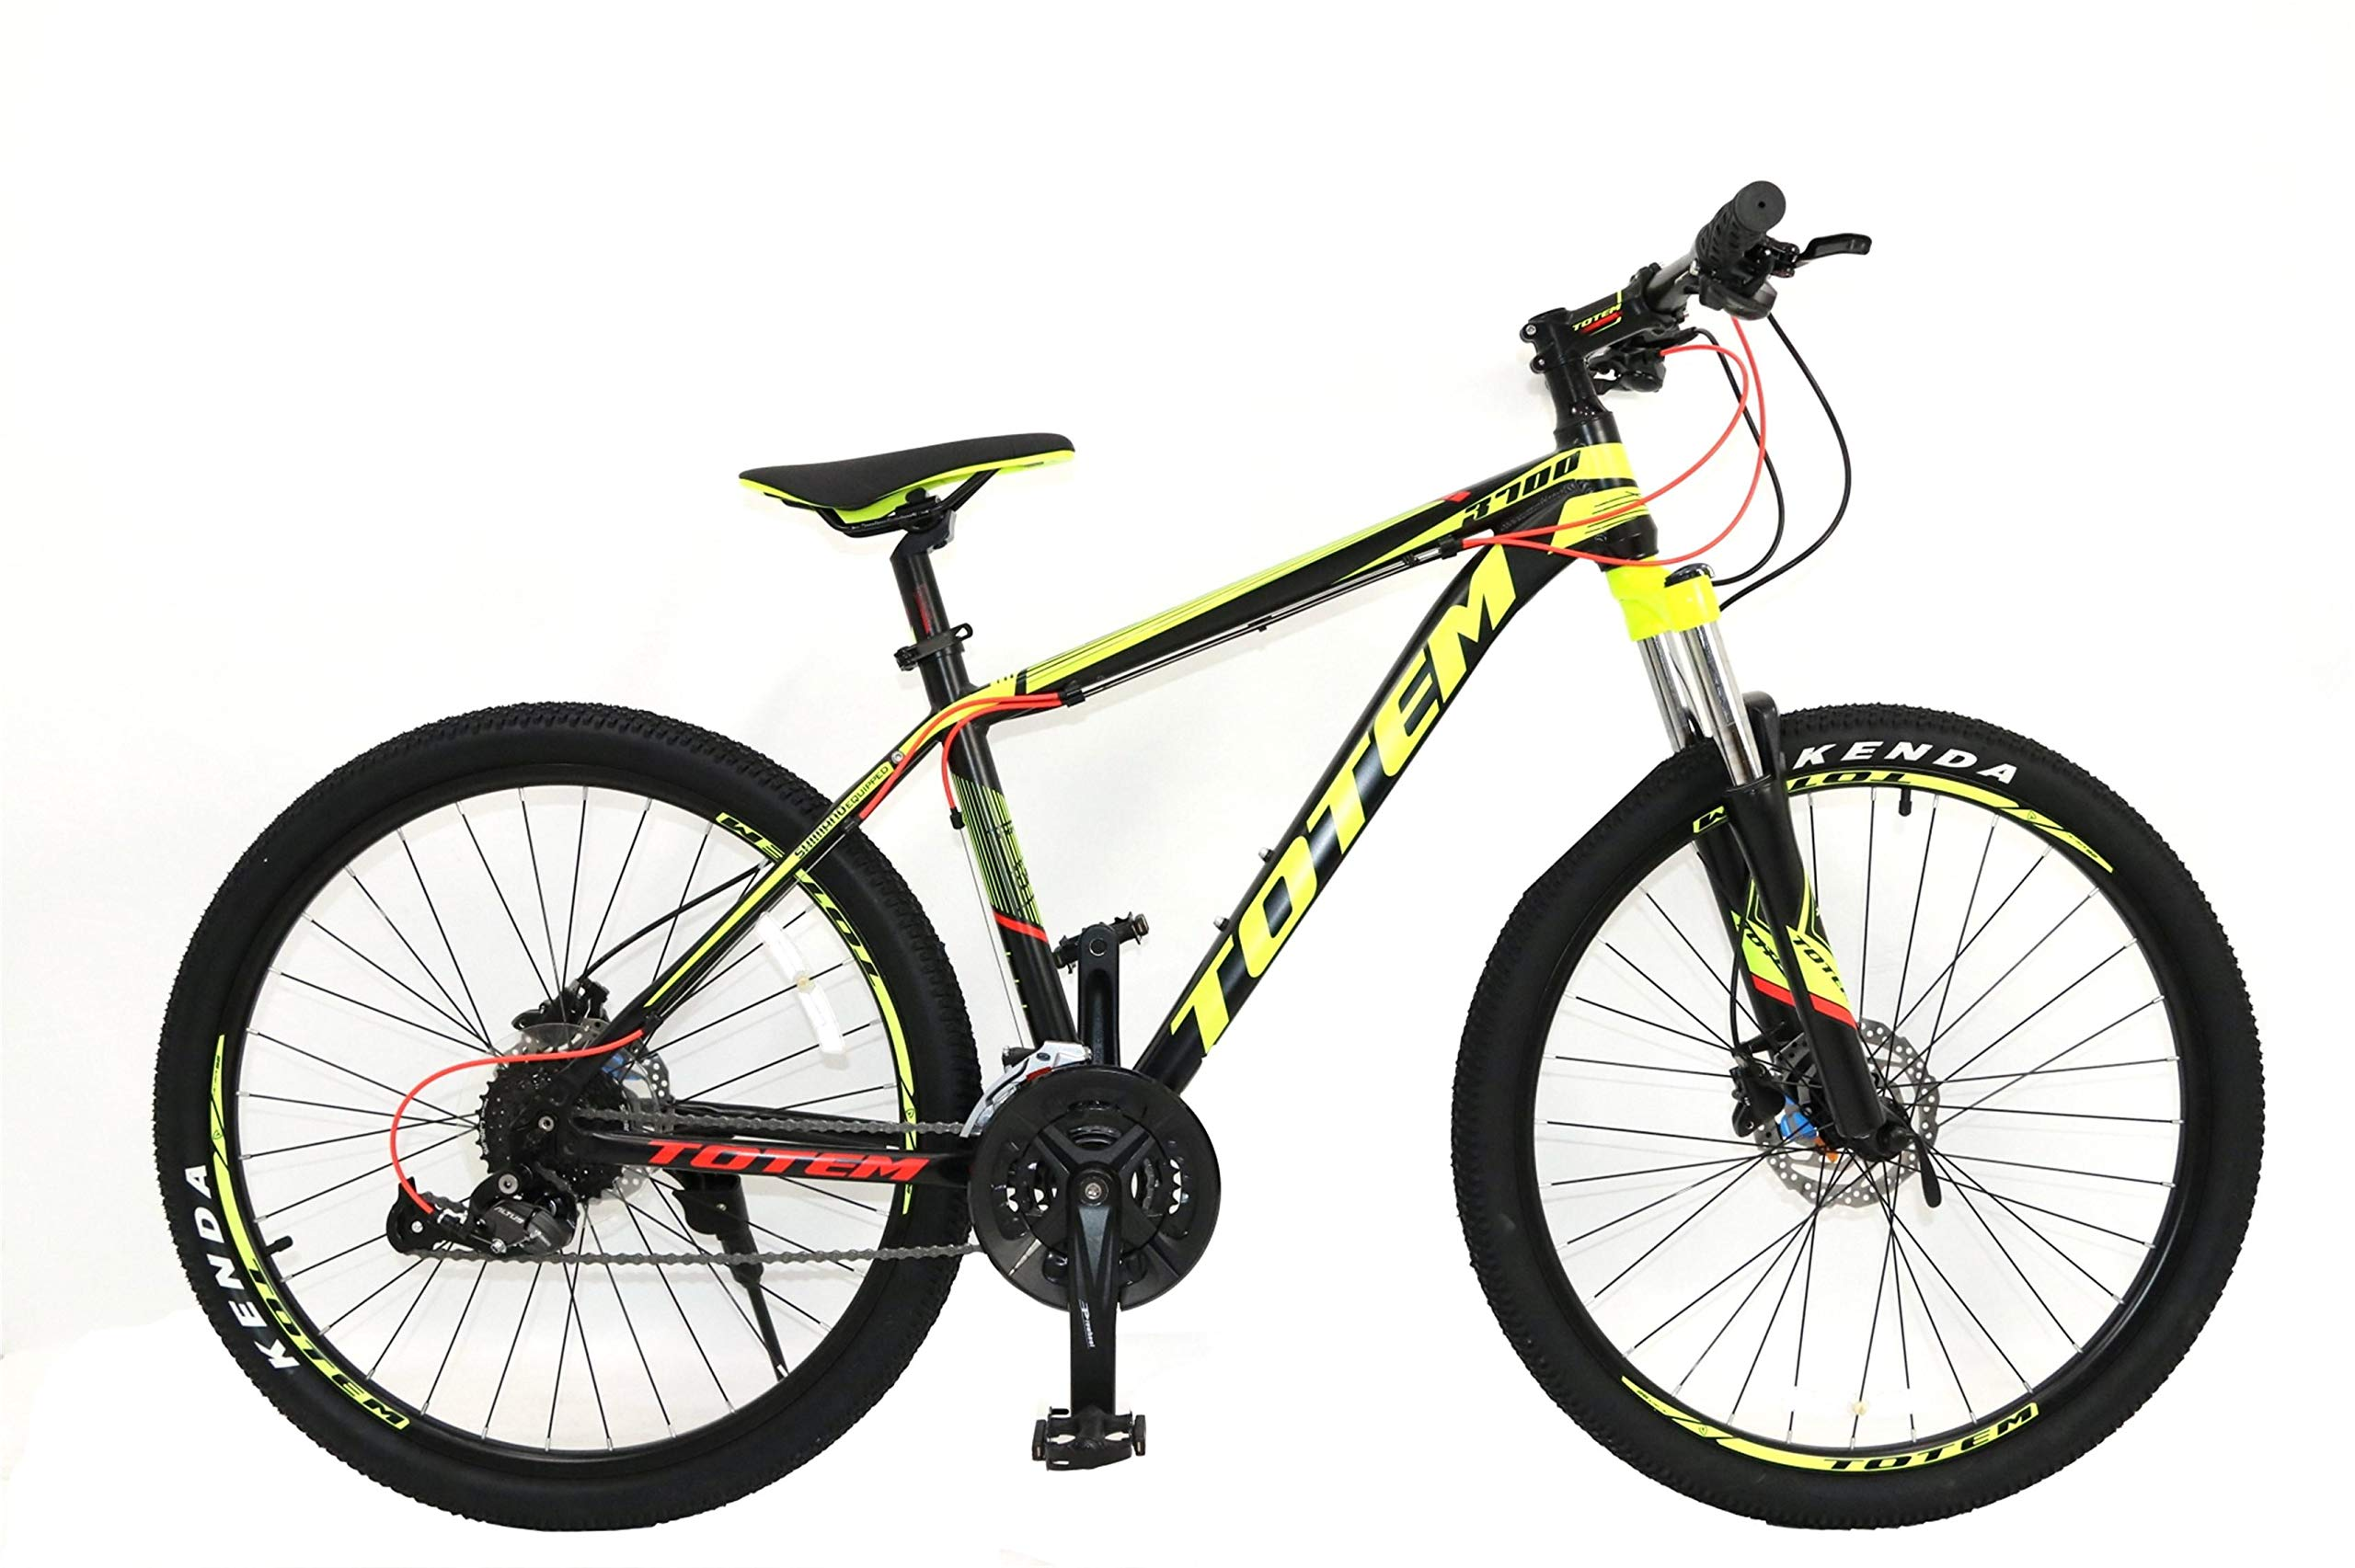 bea9a0e7093 TOTEM-3700 Aluminum Mountain Bike 27Speed Hydraulic Brake-26Inch ...